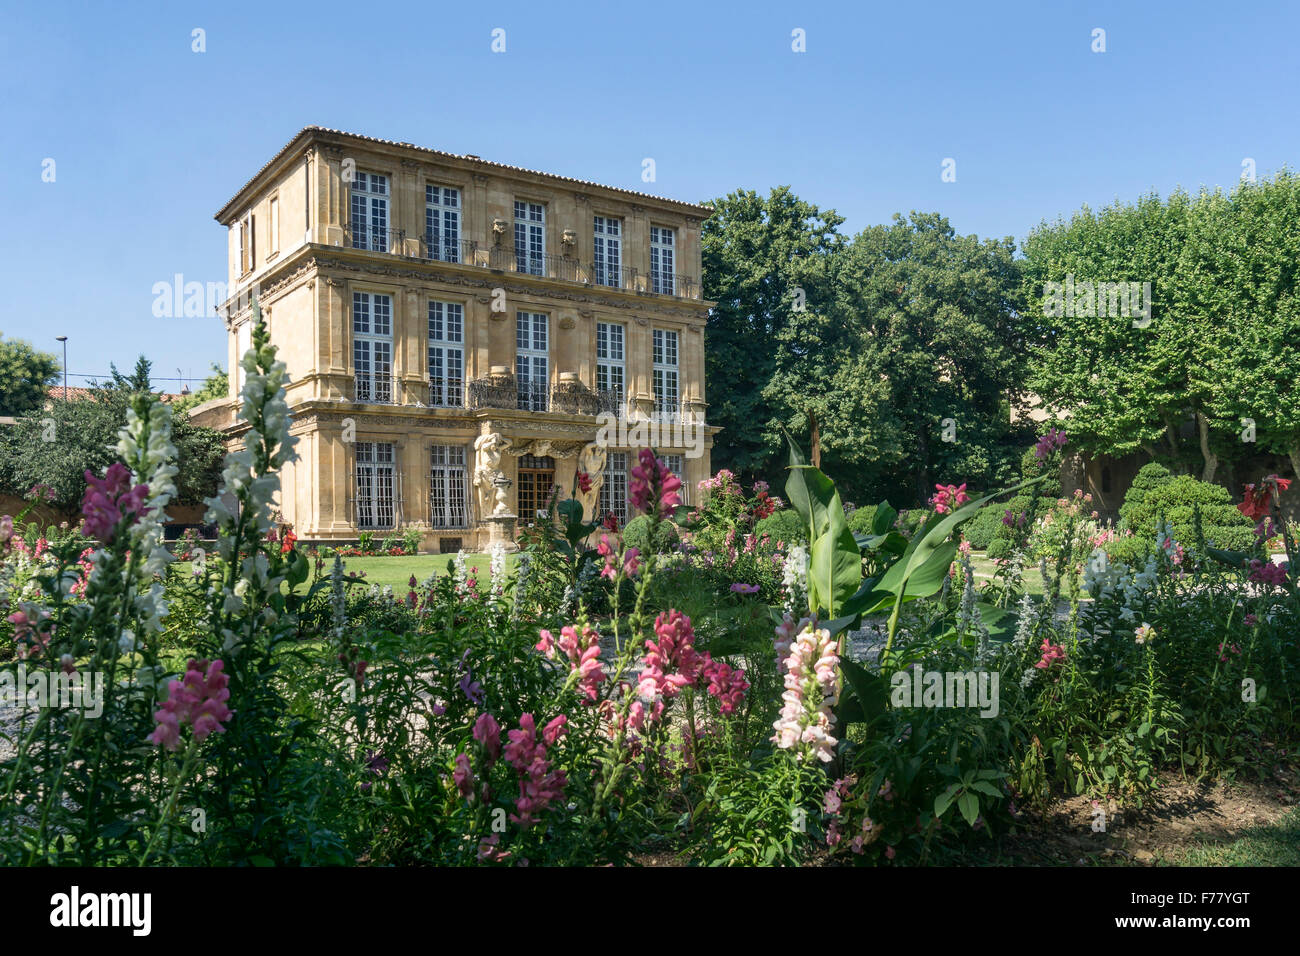 Flowers in front of Pavillon Vendome, Aix en Provence, France - Stock Image